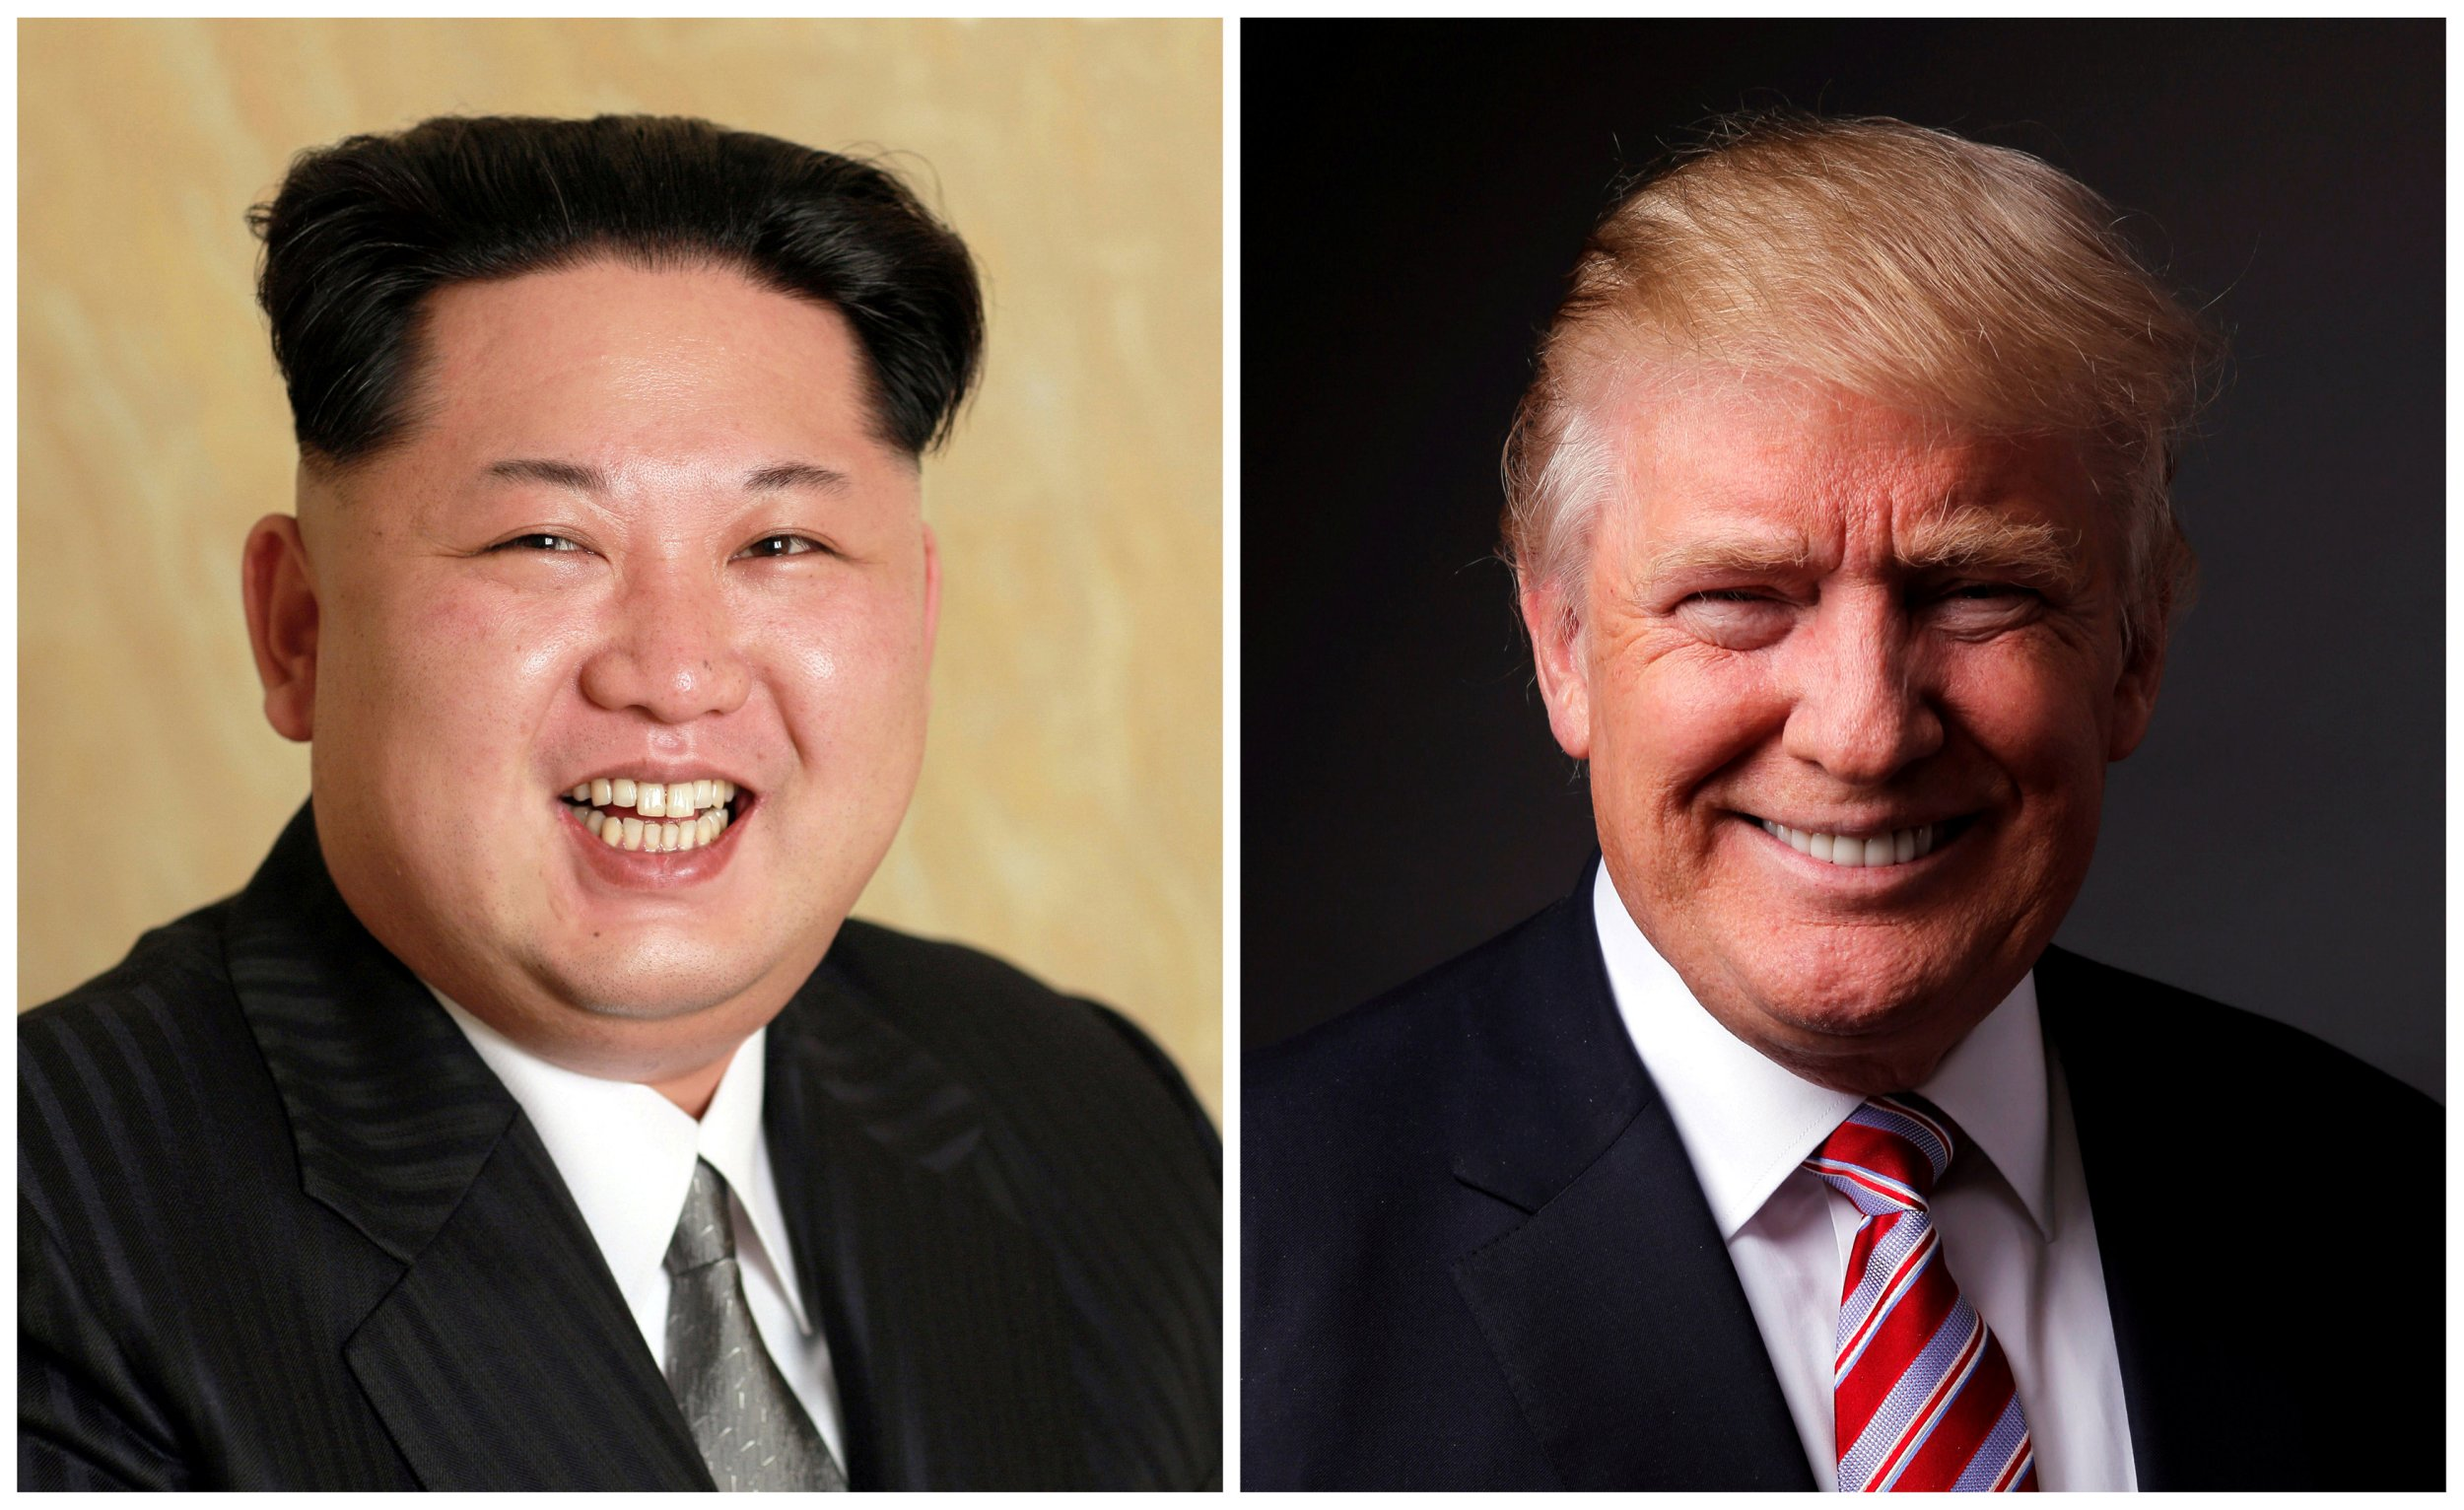 Donald Trump says he's happy talking to Kim Jong Un